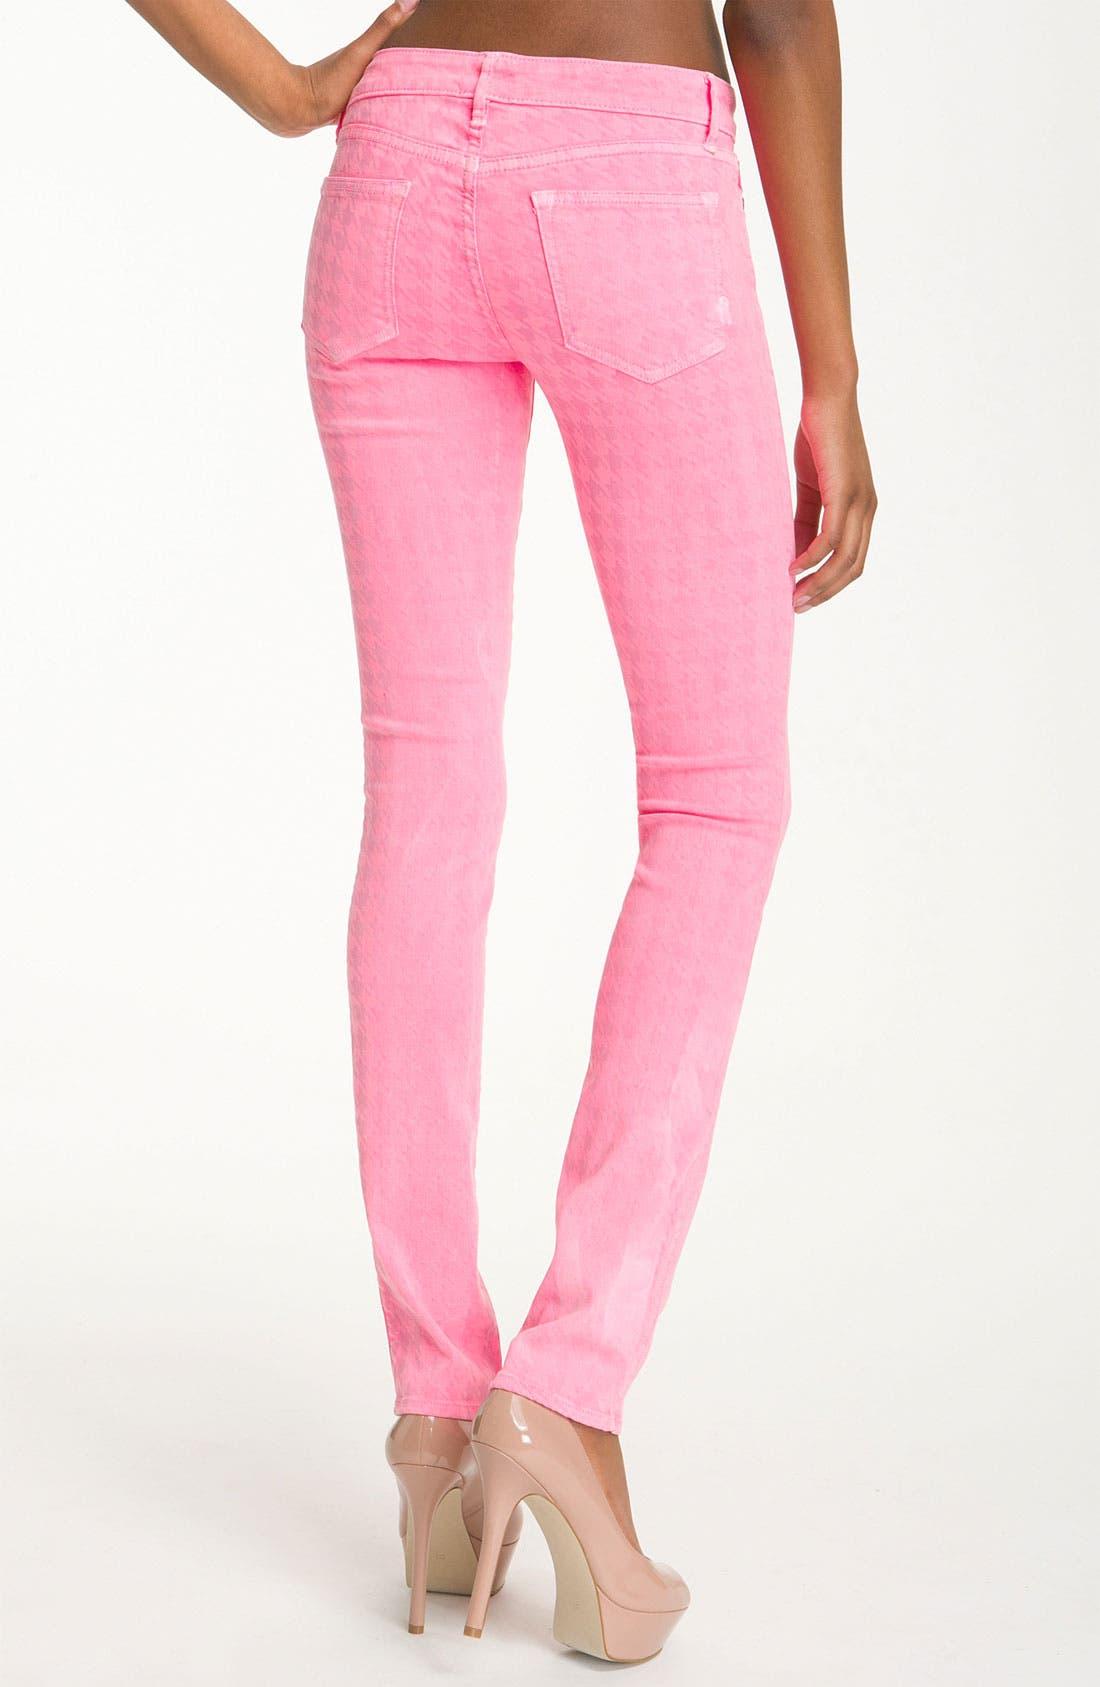 Alternate Image 2  - Rich & Skinny 'Legacy' Houndstooth Print Skinny Jeans (Neon Pink)